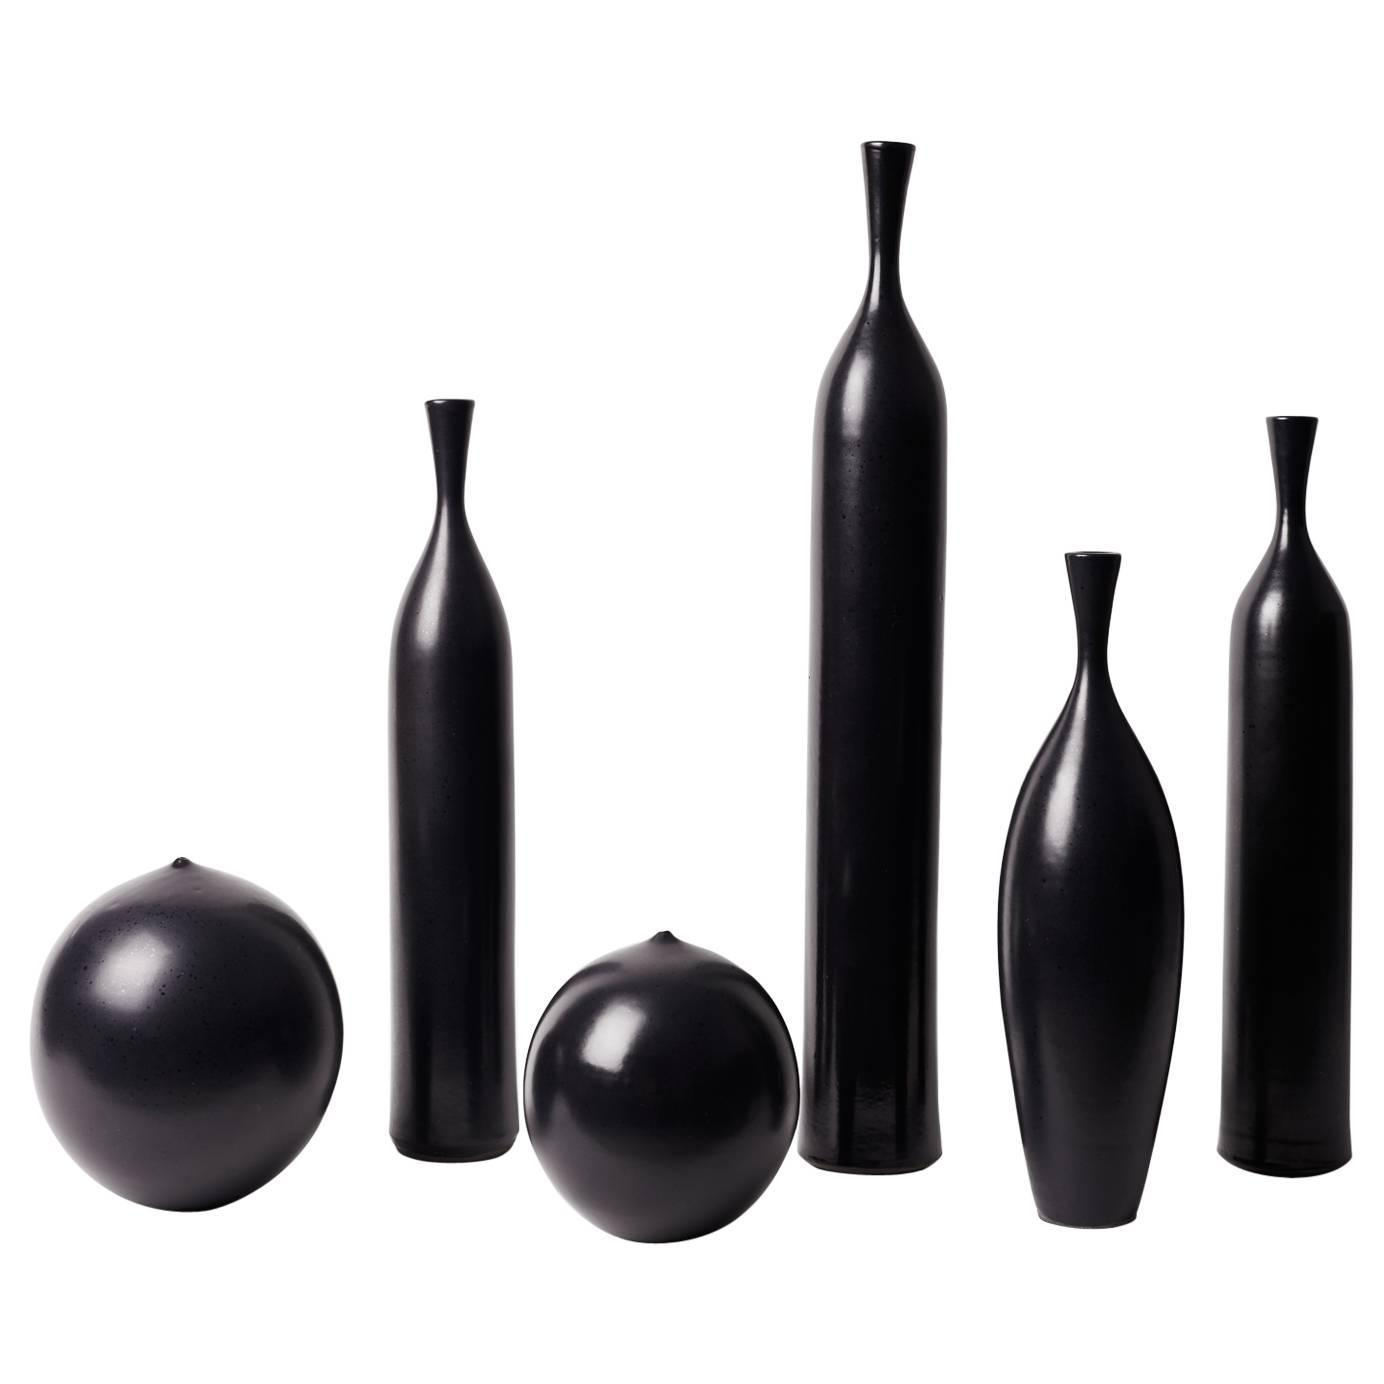 Set of six black ceramic vases signed by jo for sale at 1stdibs reviewsmspy